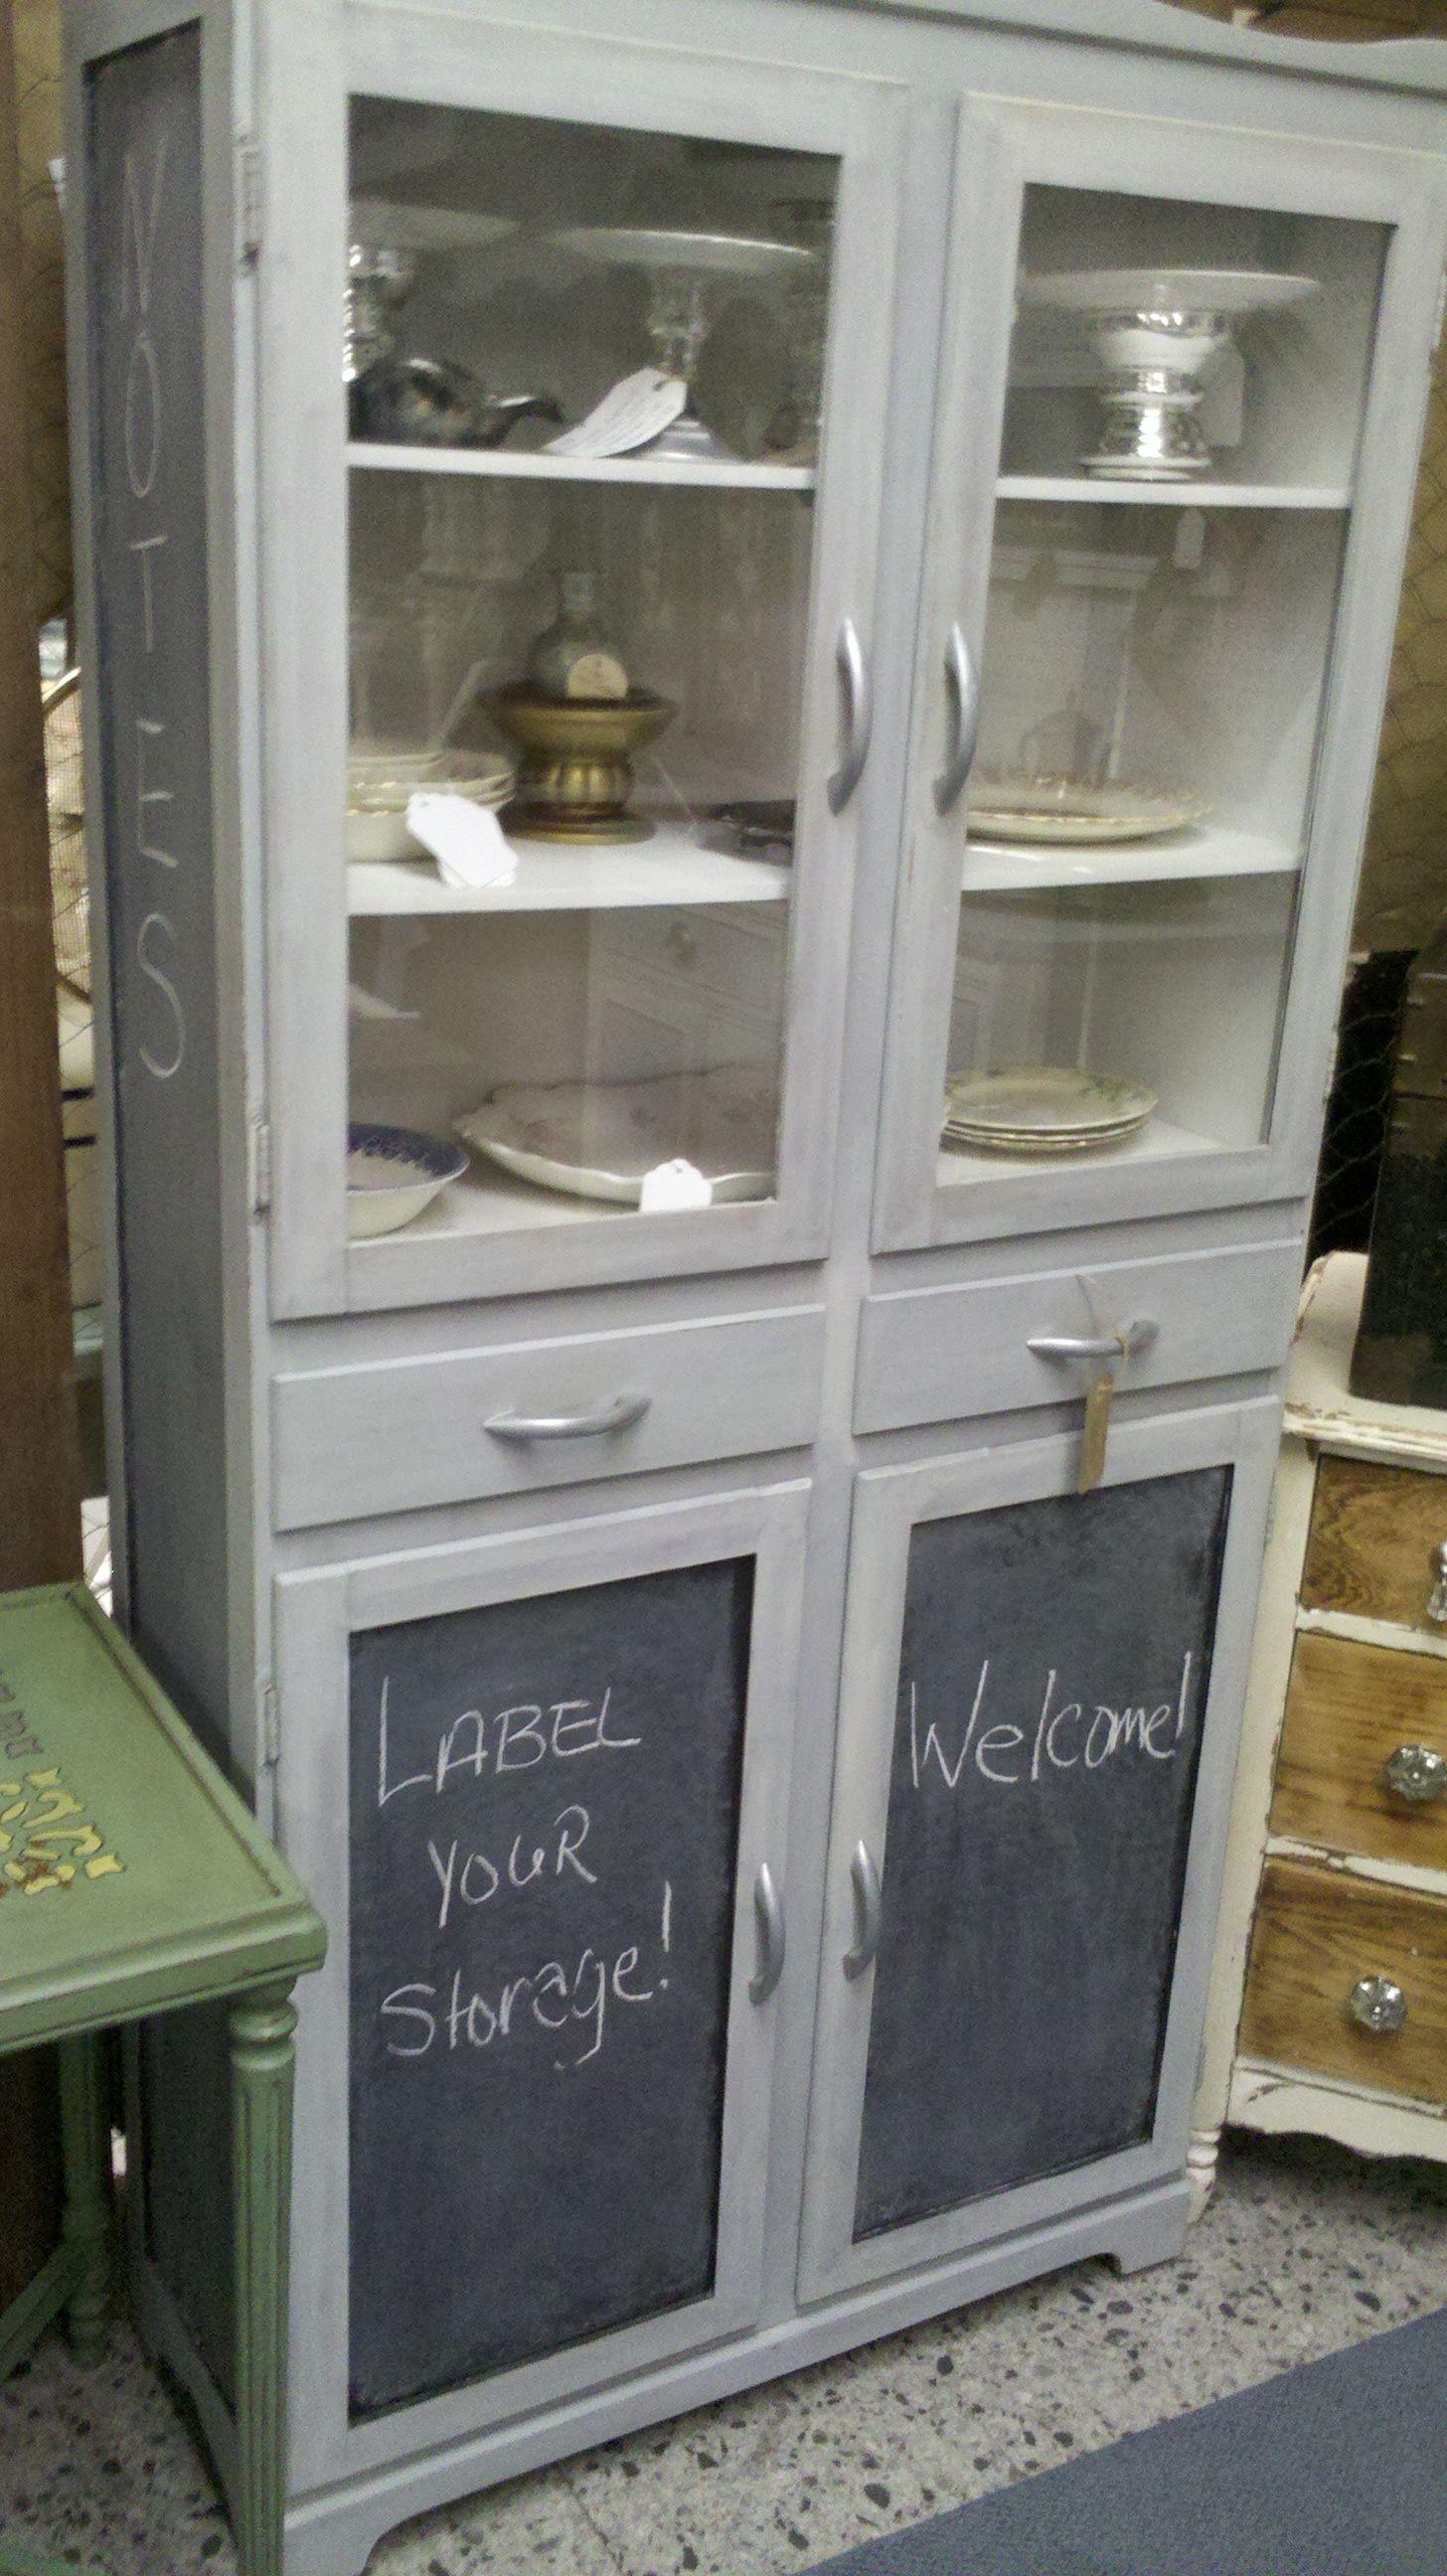 Vintage Kitchen Space Vintage Kitchen Cabinets Creative Kitchen Ideas Kitchen Cabinets For Sale